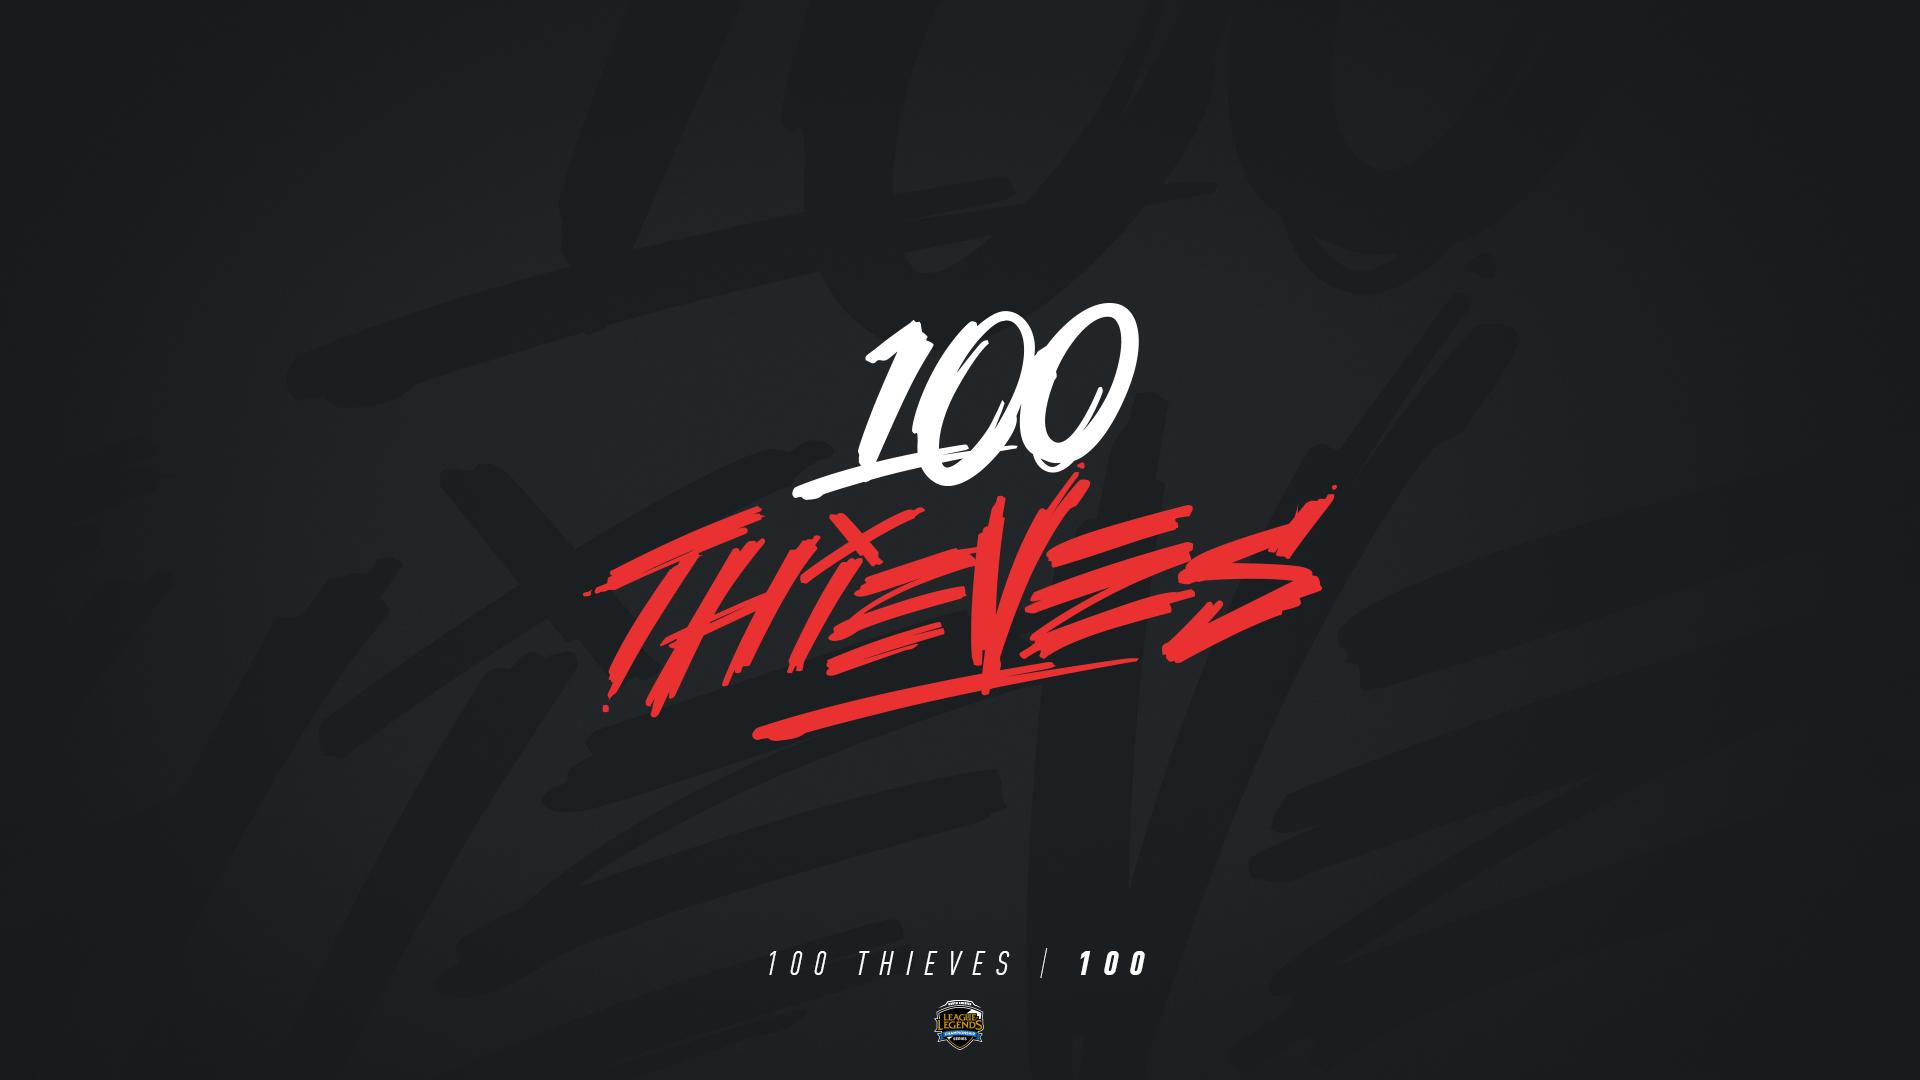 100 Thieves Aphromoo